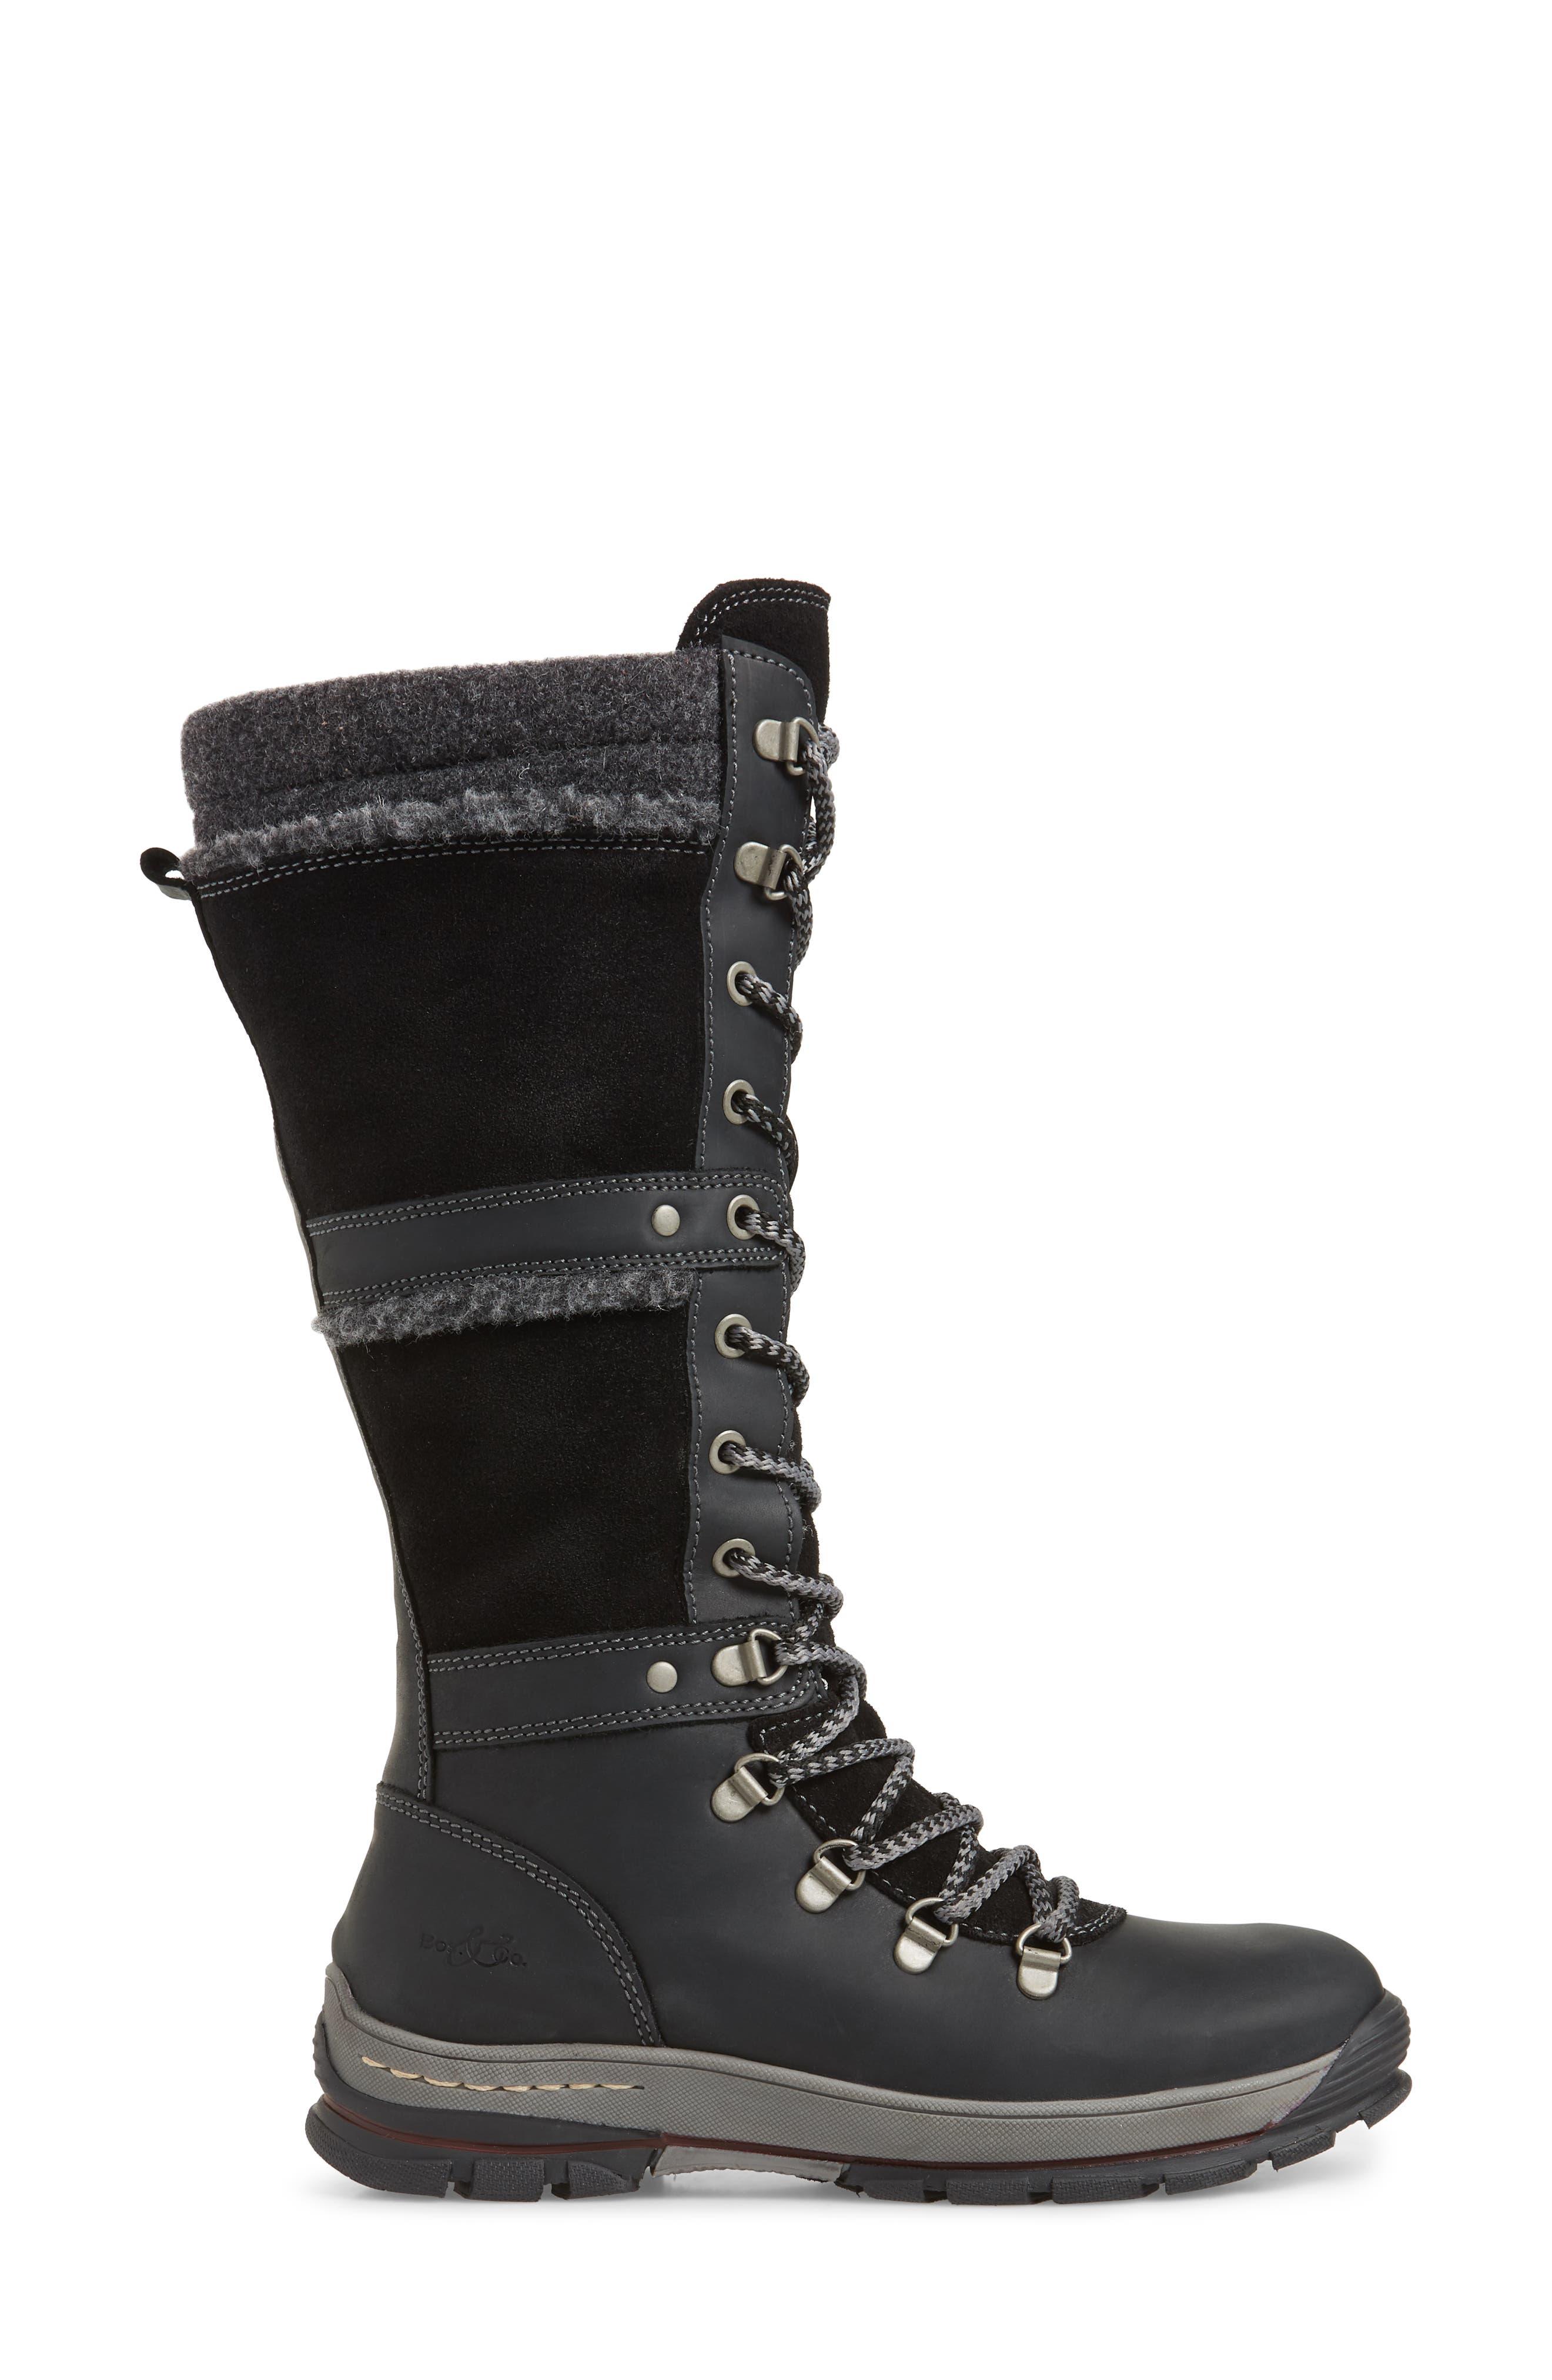 BOS. & CO., Gabriella Waterproof Boot, Alternate thumbnail 3, color, BLACK/ DARK GREY CROMAGNON